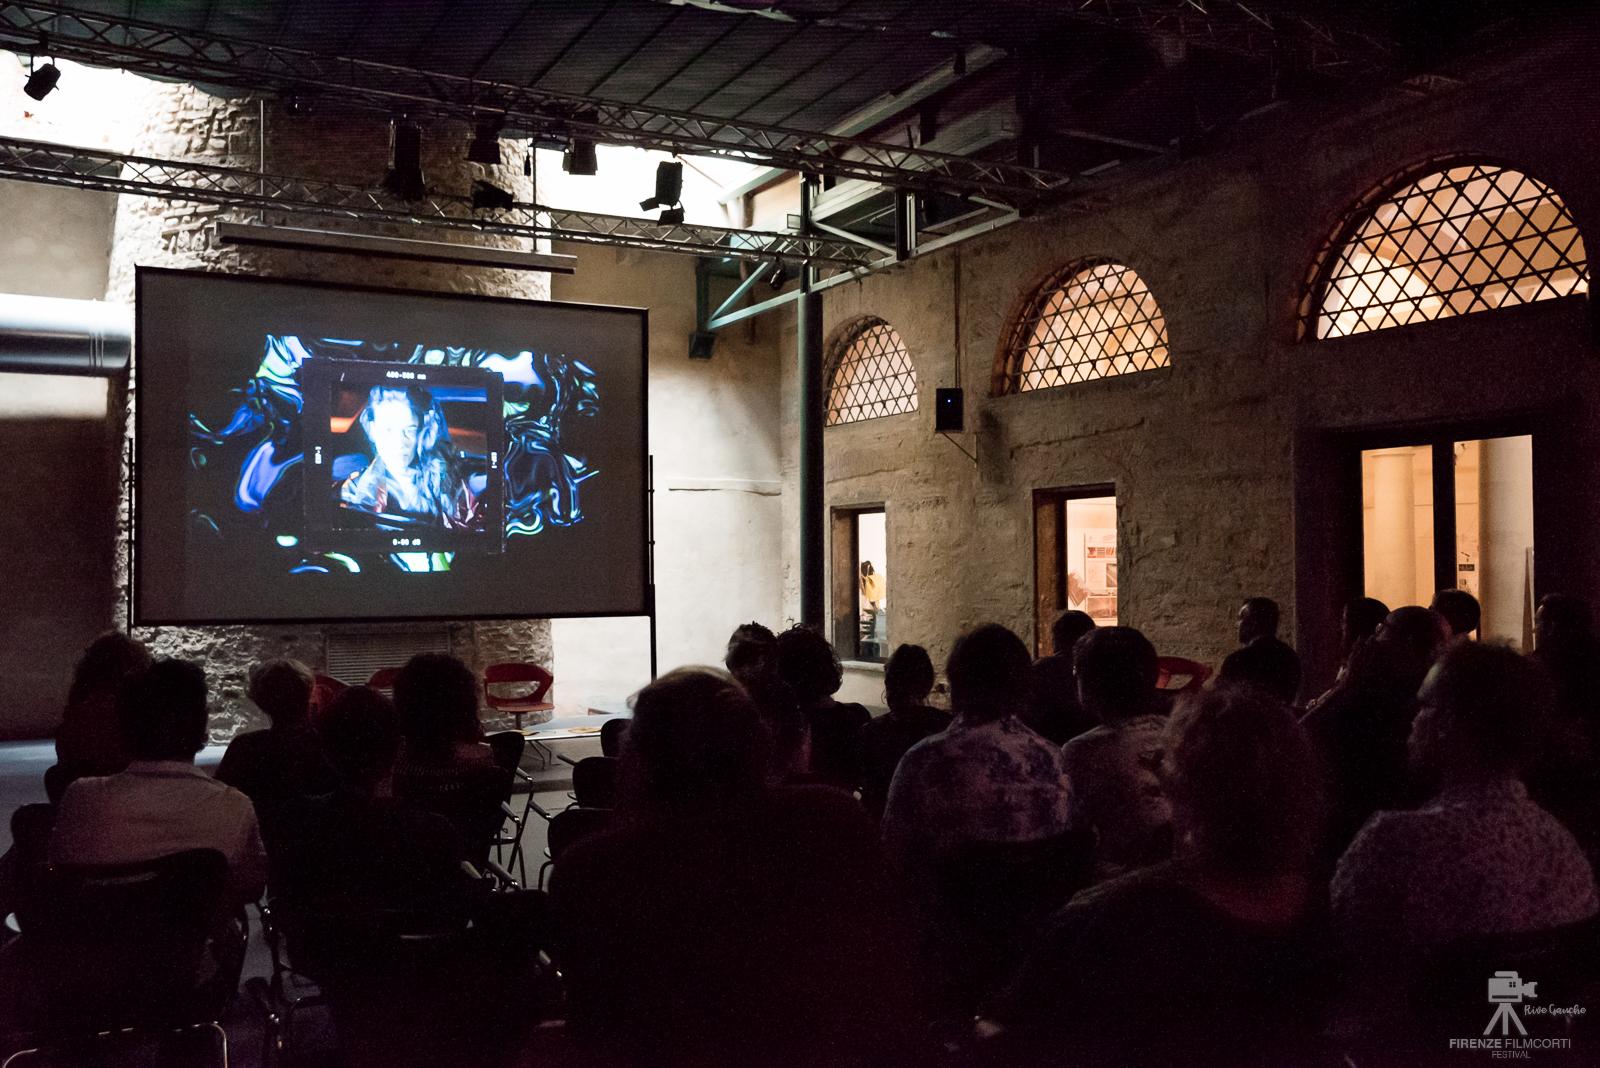 2018-06-16 - Rive Gauche - 2018 Firenze FilmCorti Festival-logofestival-69